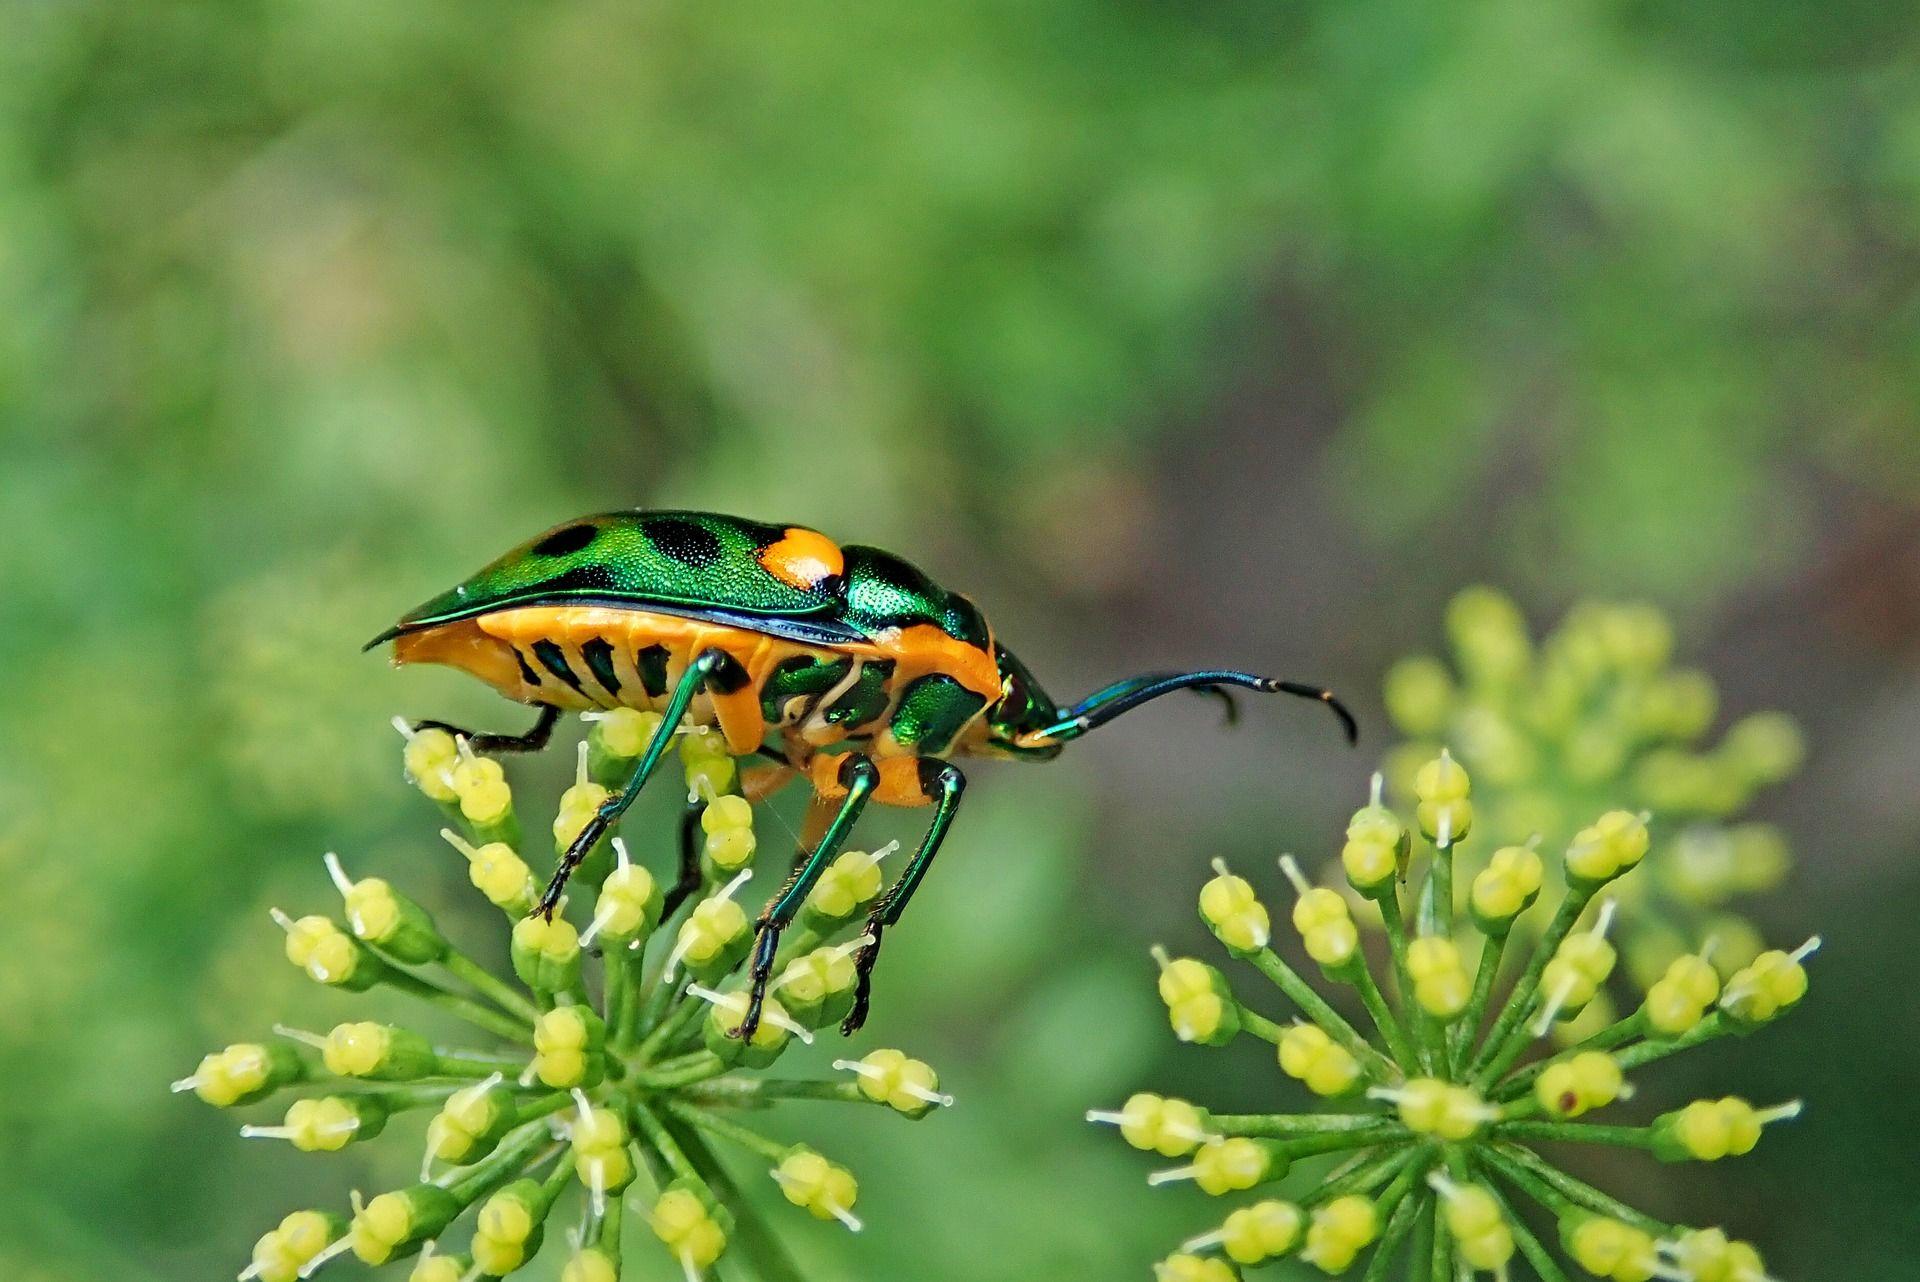 Смотреть красивое фото жука на природе